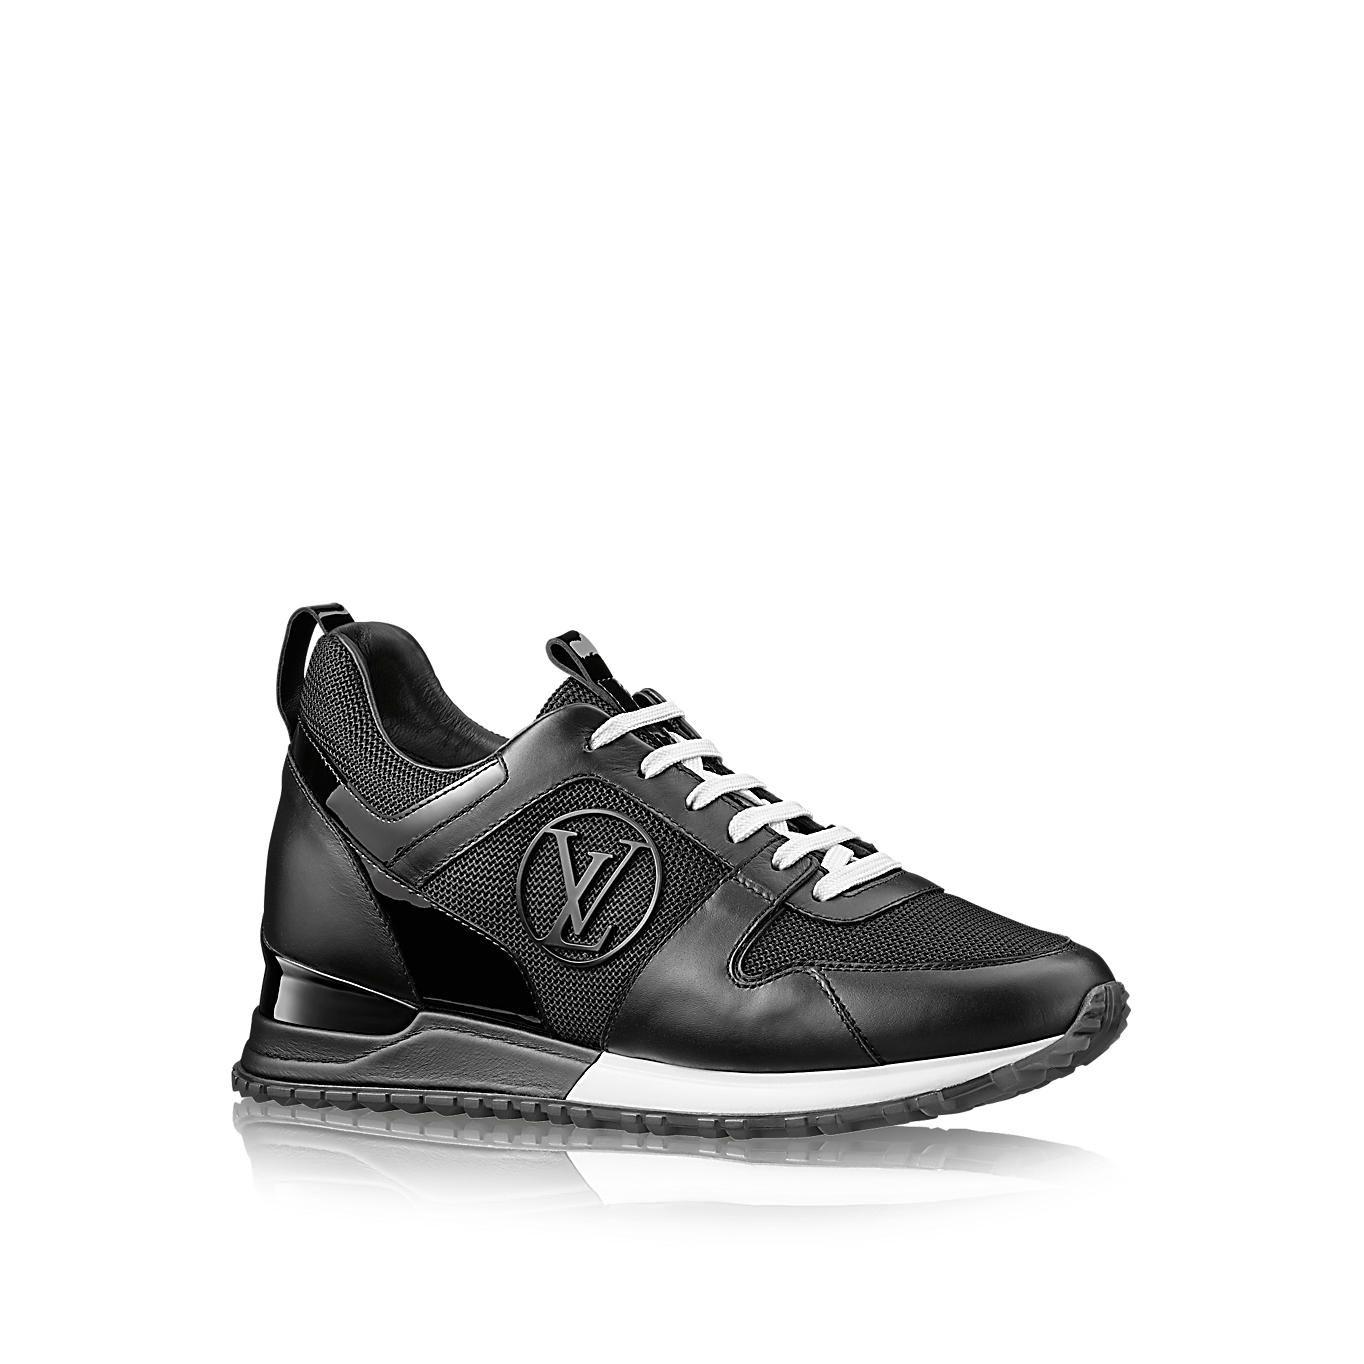 1ff87f2b Zapatilla deportiva Run Away | Sneakers | Sneakers, Louis vuitton, Shoes